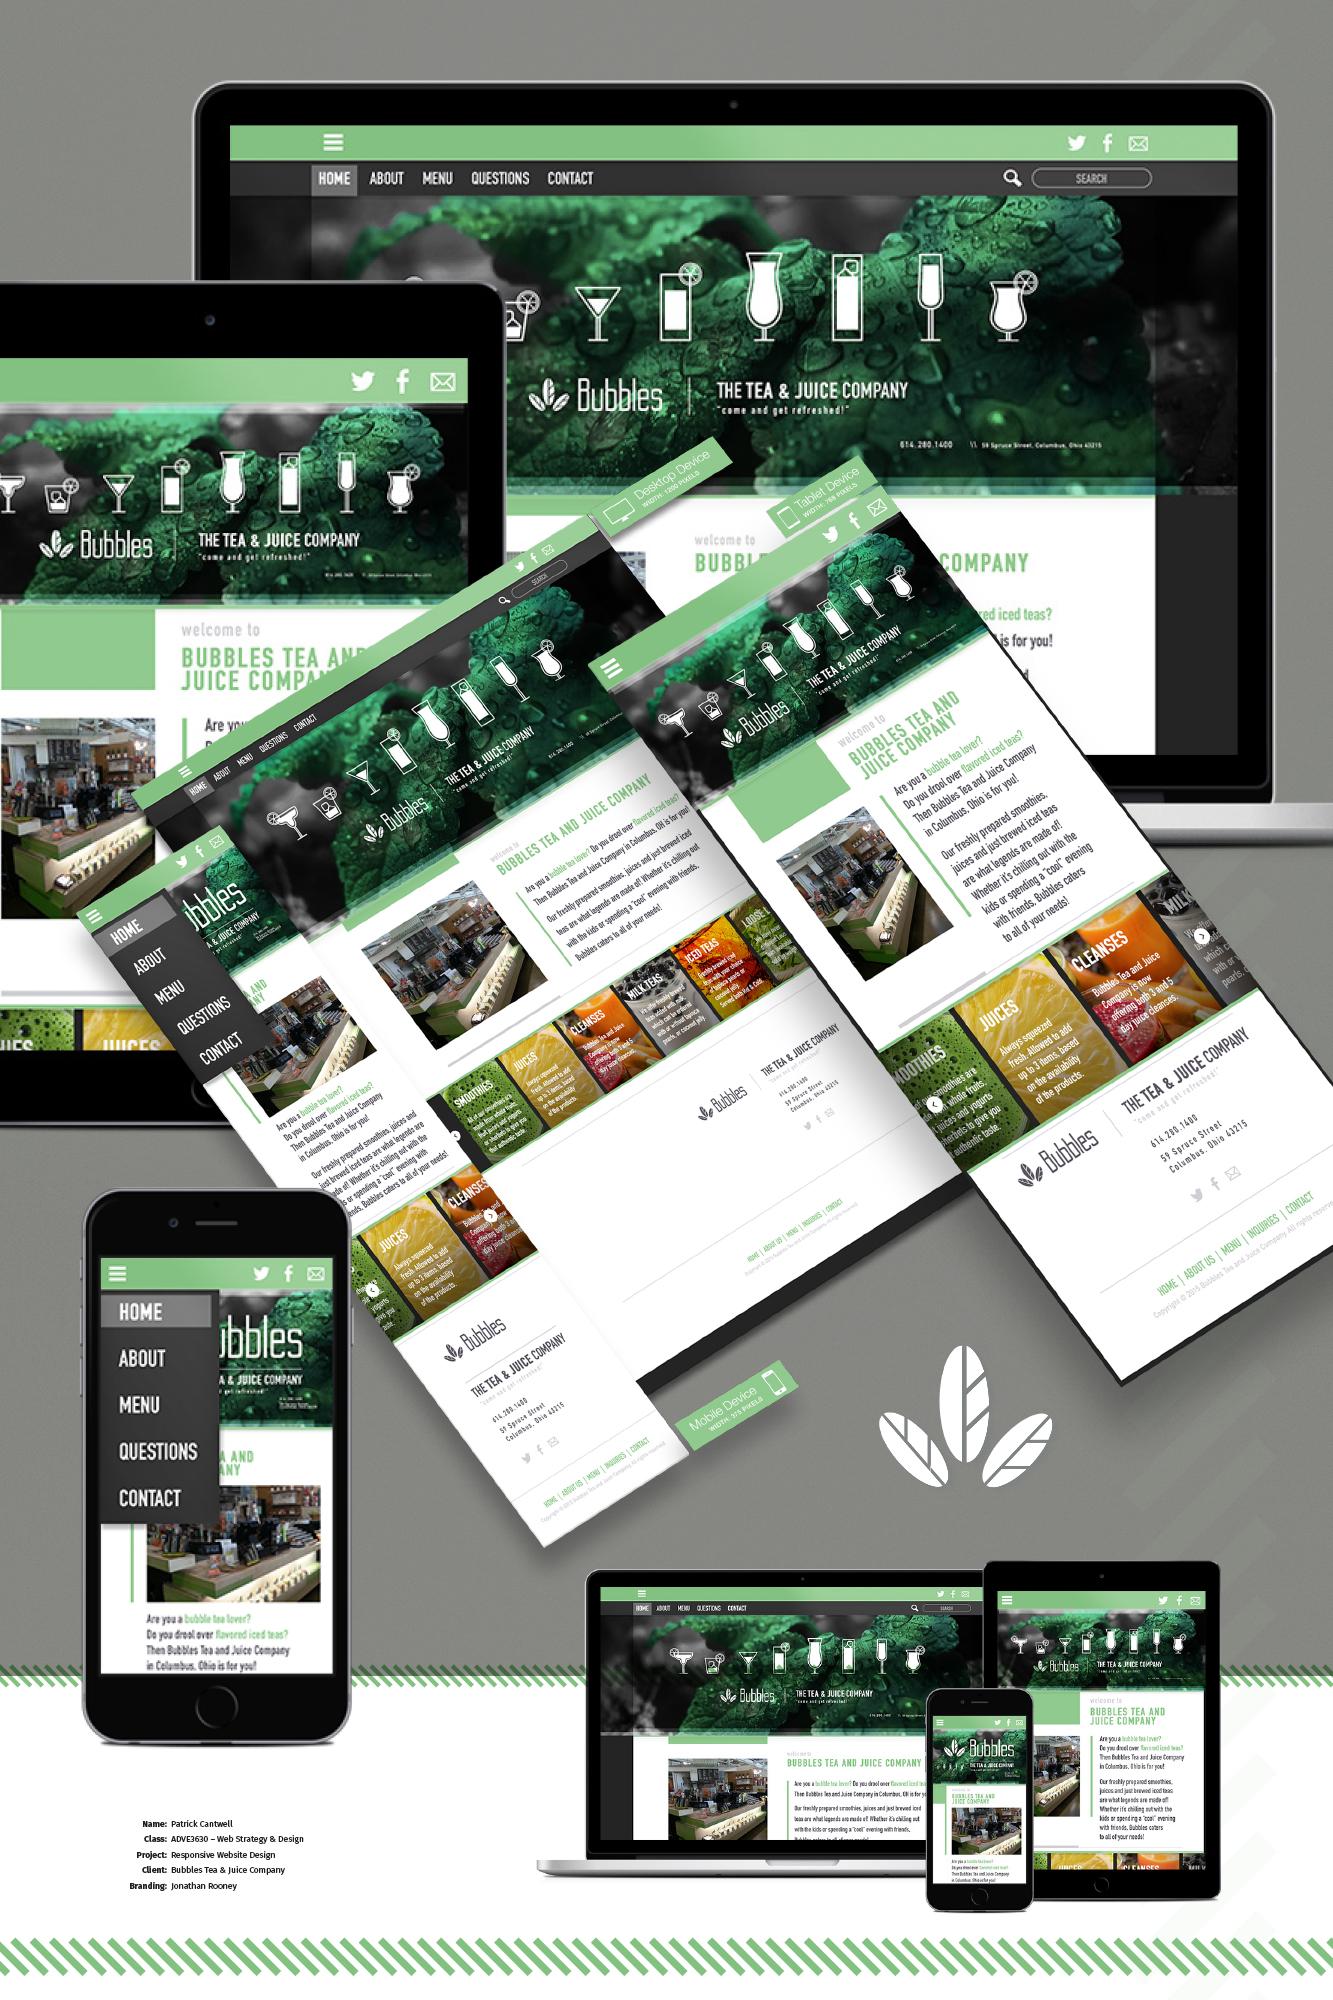 ADVE3630_Bennett_Responsive Site Design_Patrick Cantwell.jpg